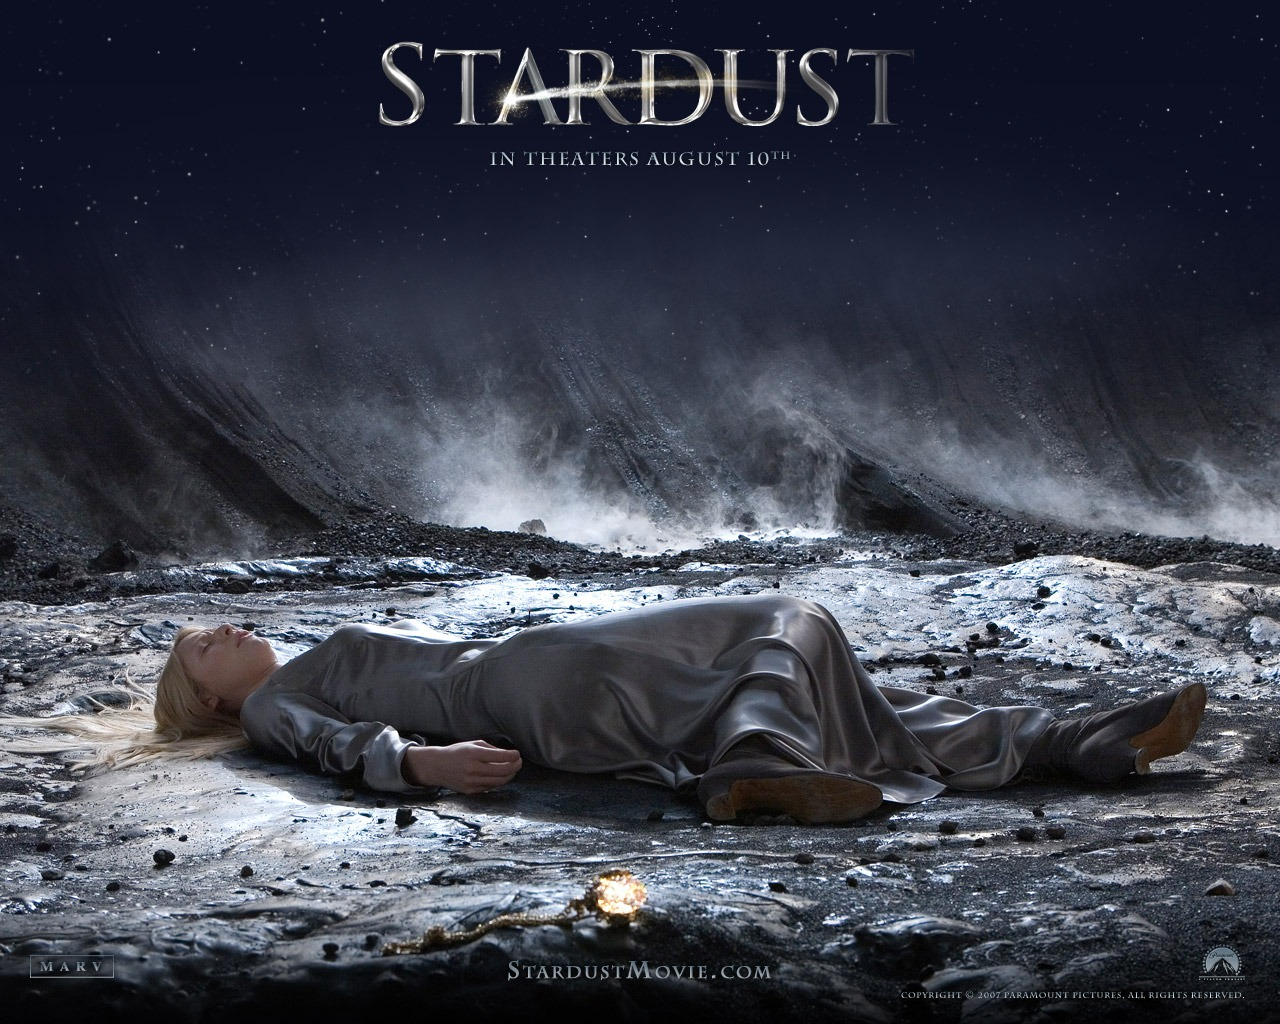 Stardust Yvaine Wallpaper Stardust Movies Wallpapers In Jpg Format